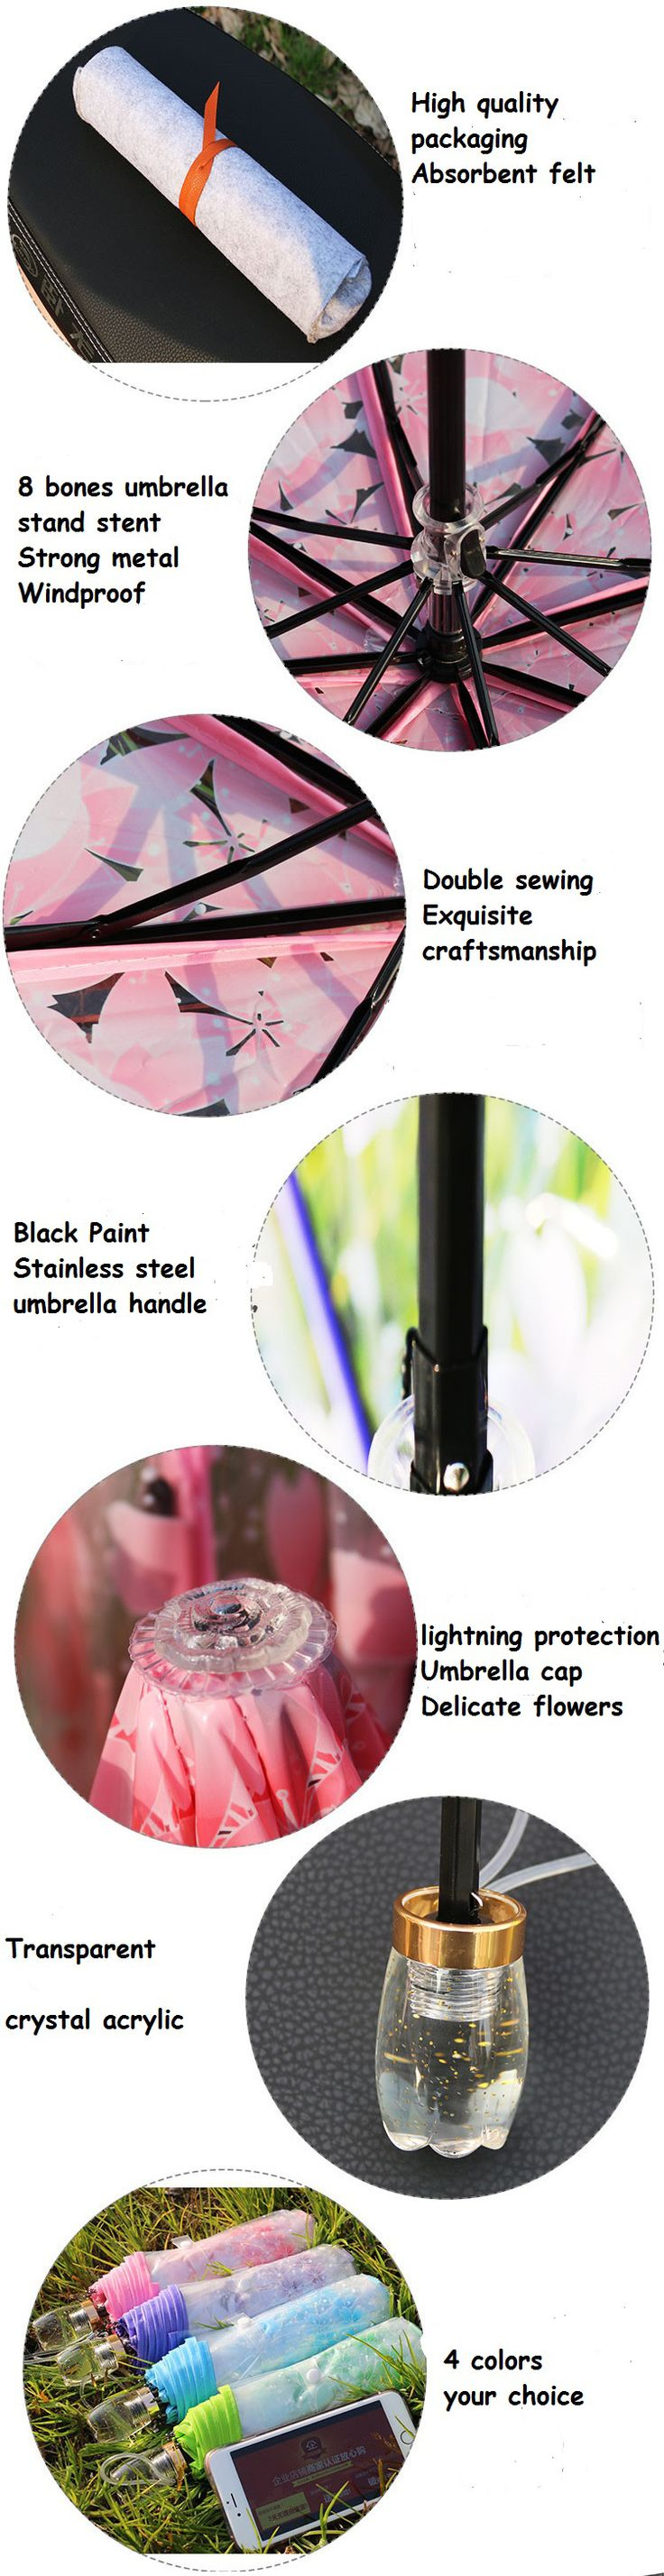 SaicleHome PEVA Romantic Cherry Blossoms Transparent Umbrella Folding Umbrella Sun Rain Gear - Newchic